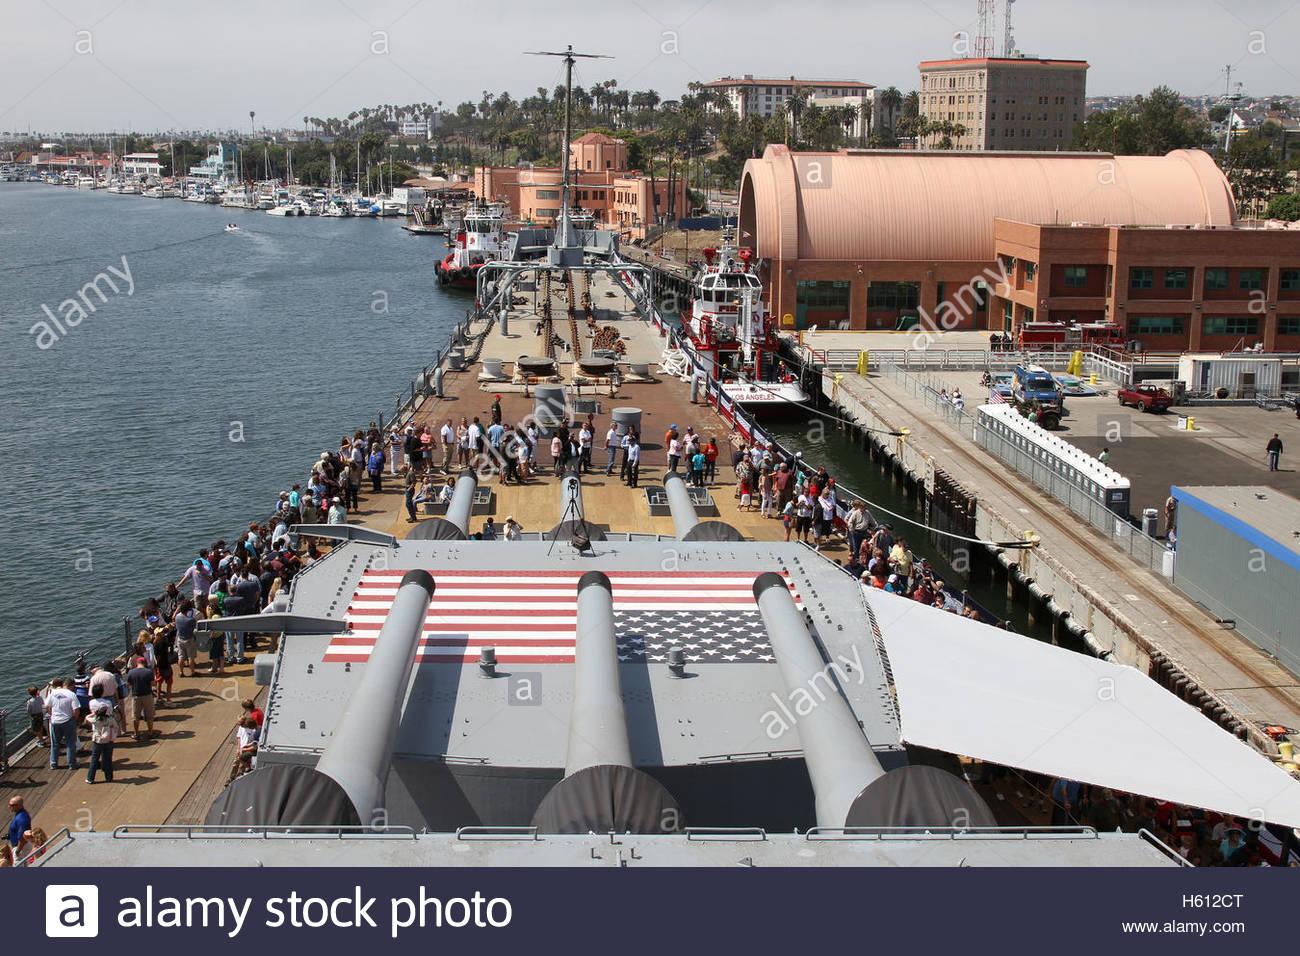 USS Iowa, first public tour July 7 2012, battleship, warship, U.S Navy - Stock Image